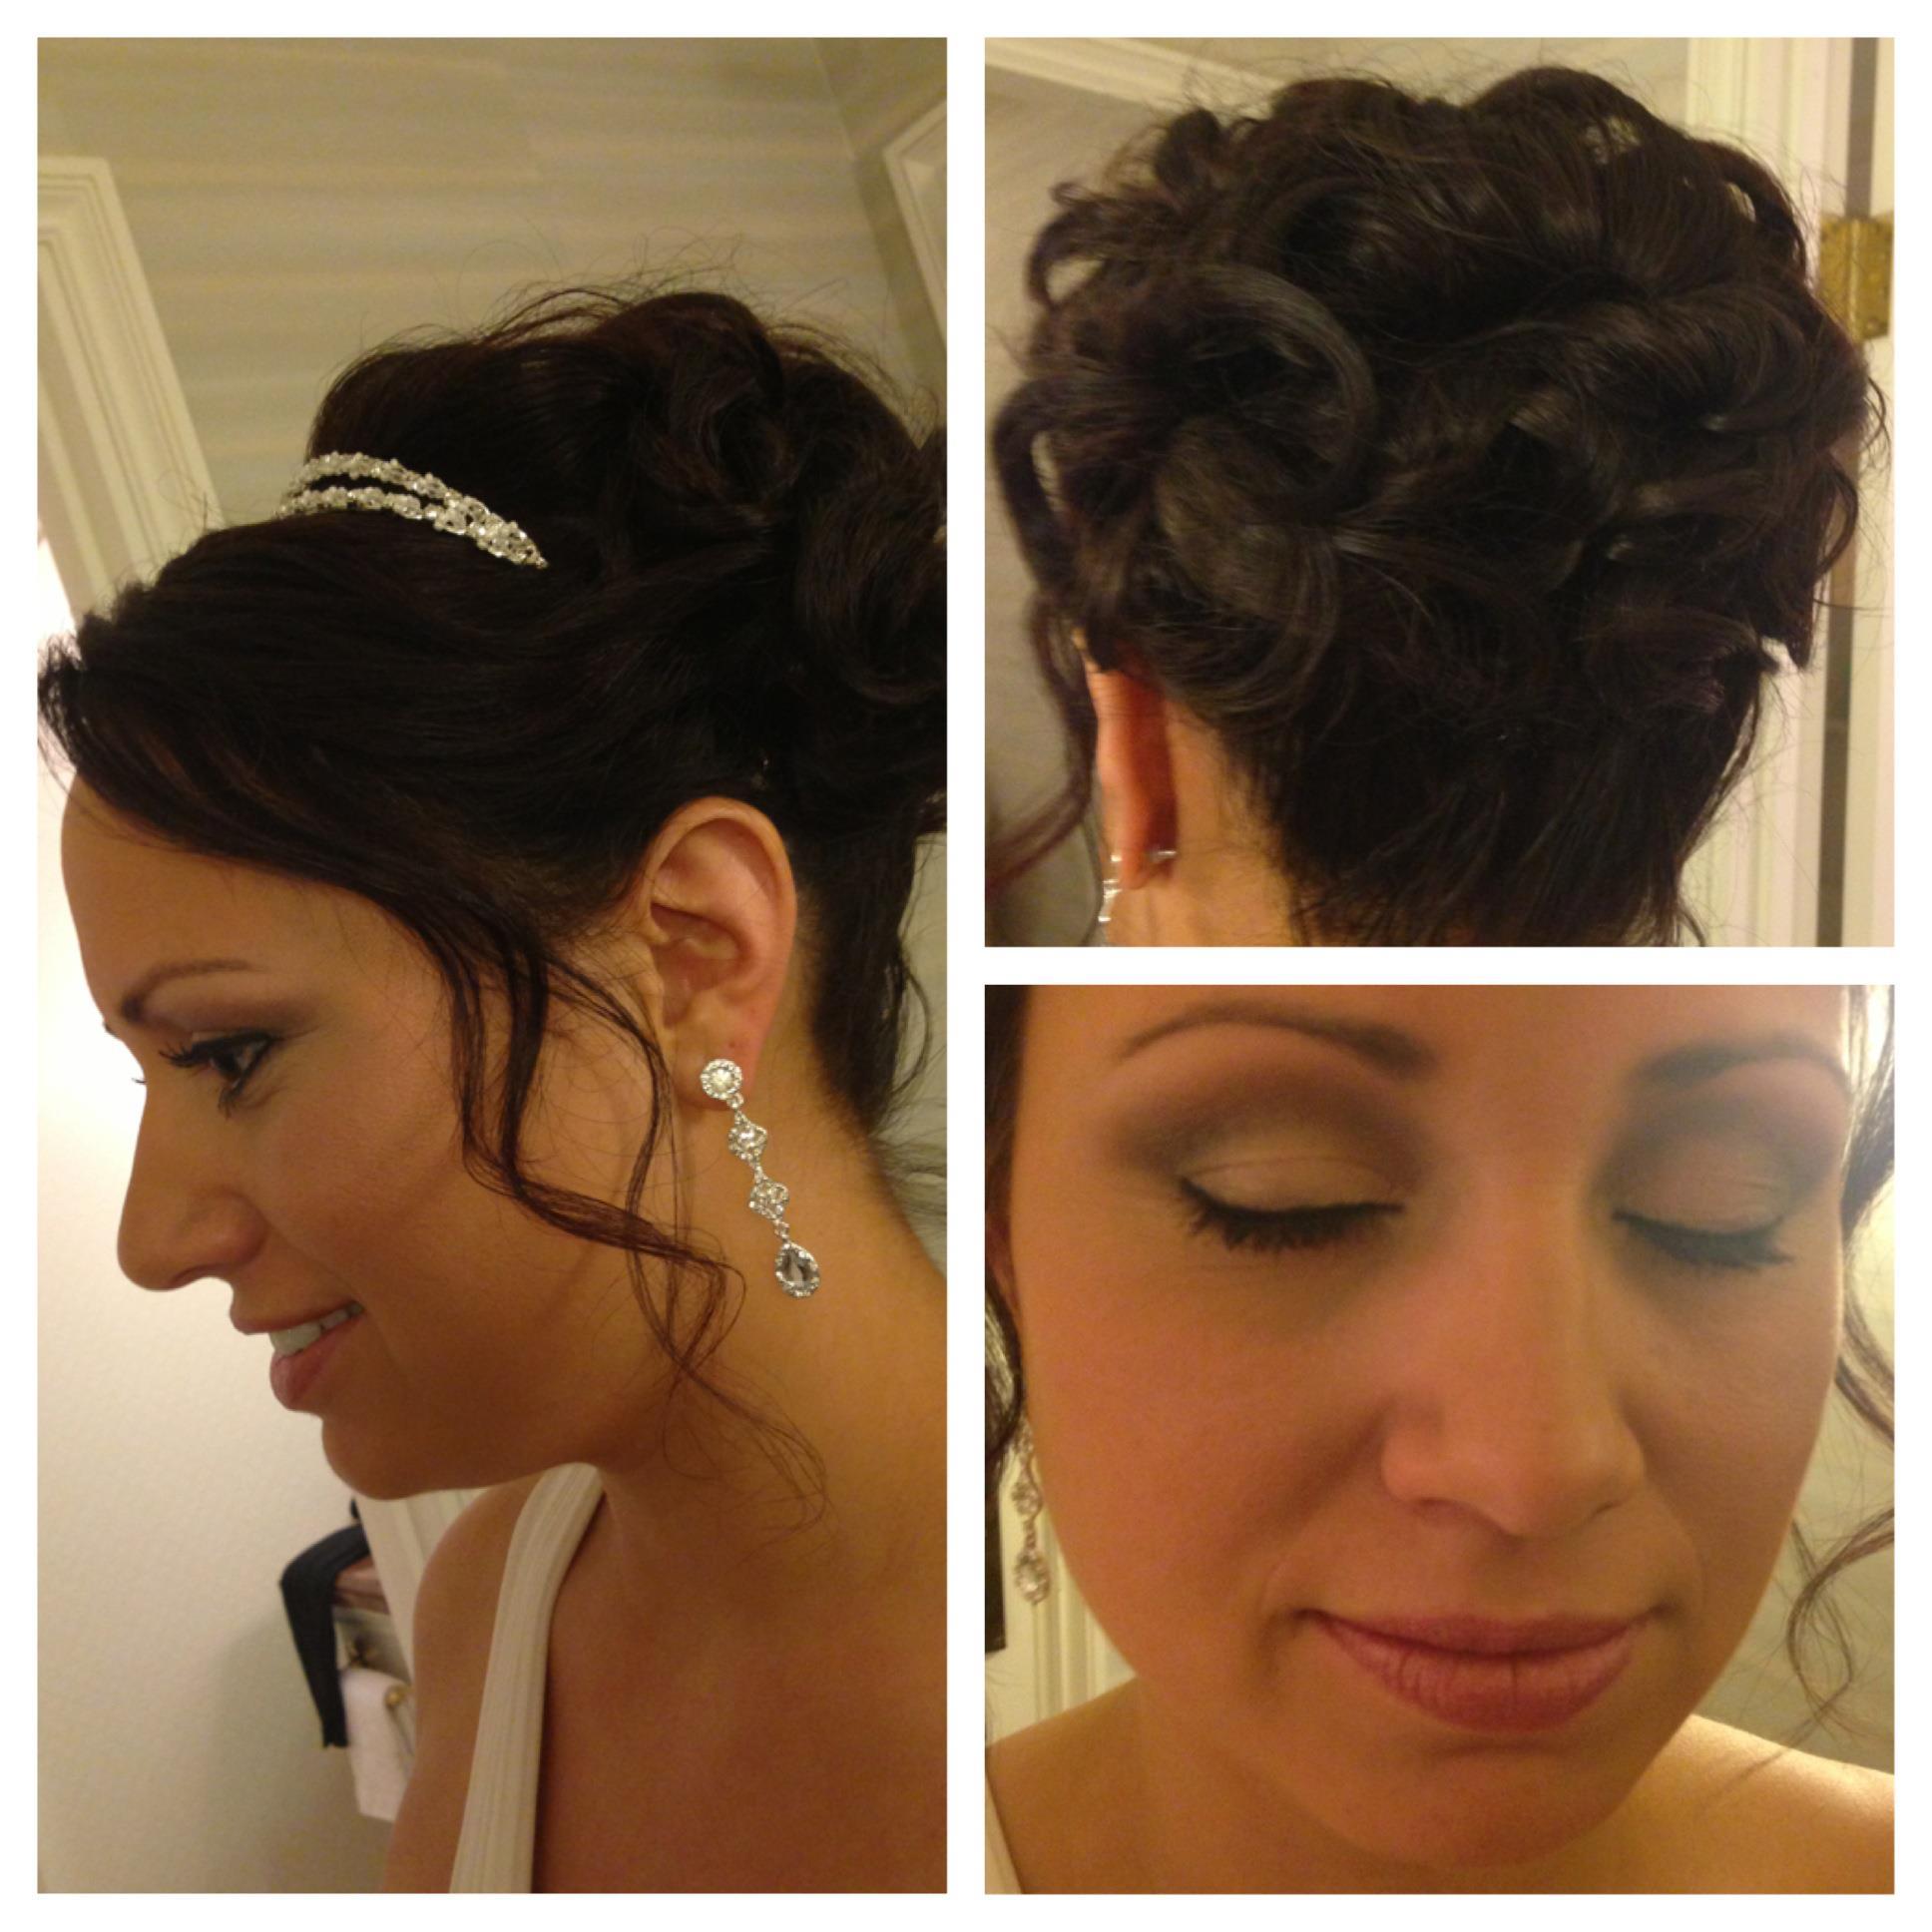 Traditional bridal Hair and makeup